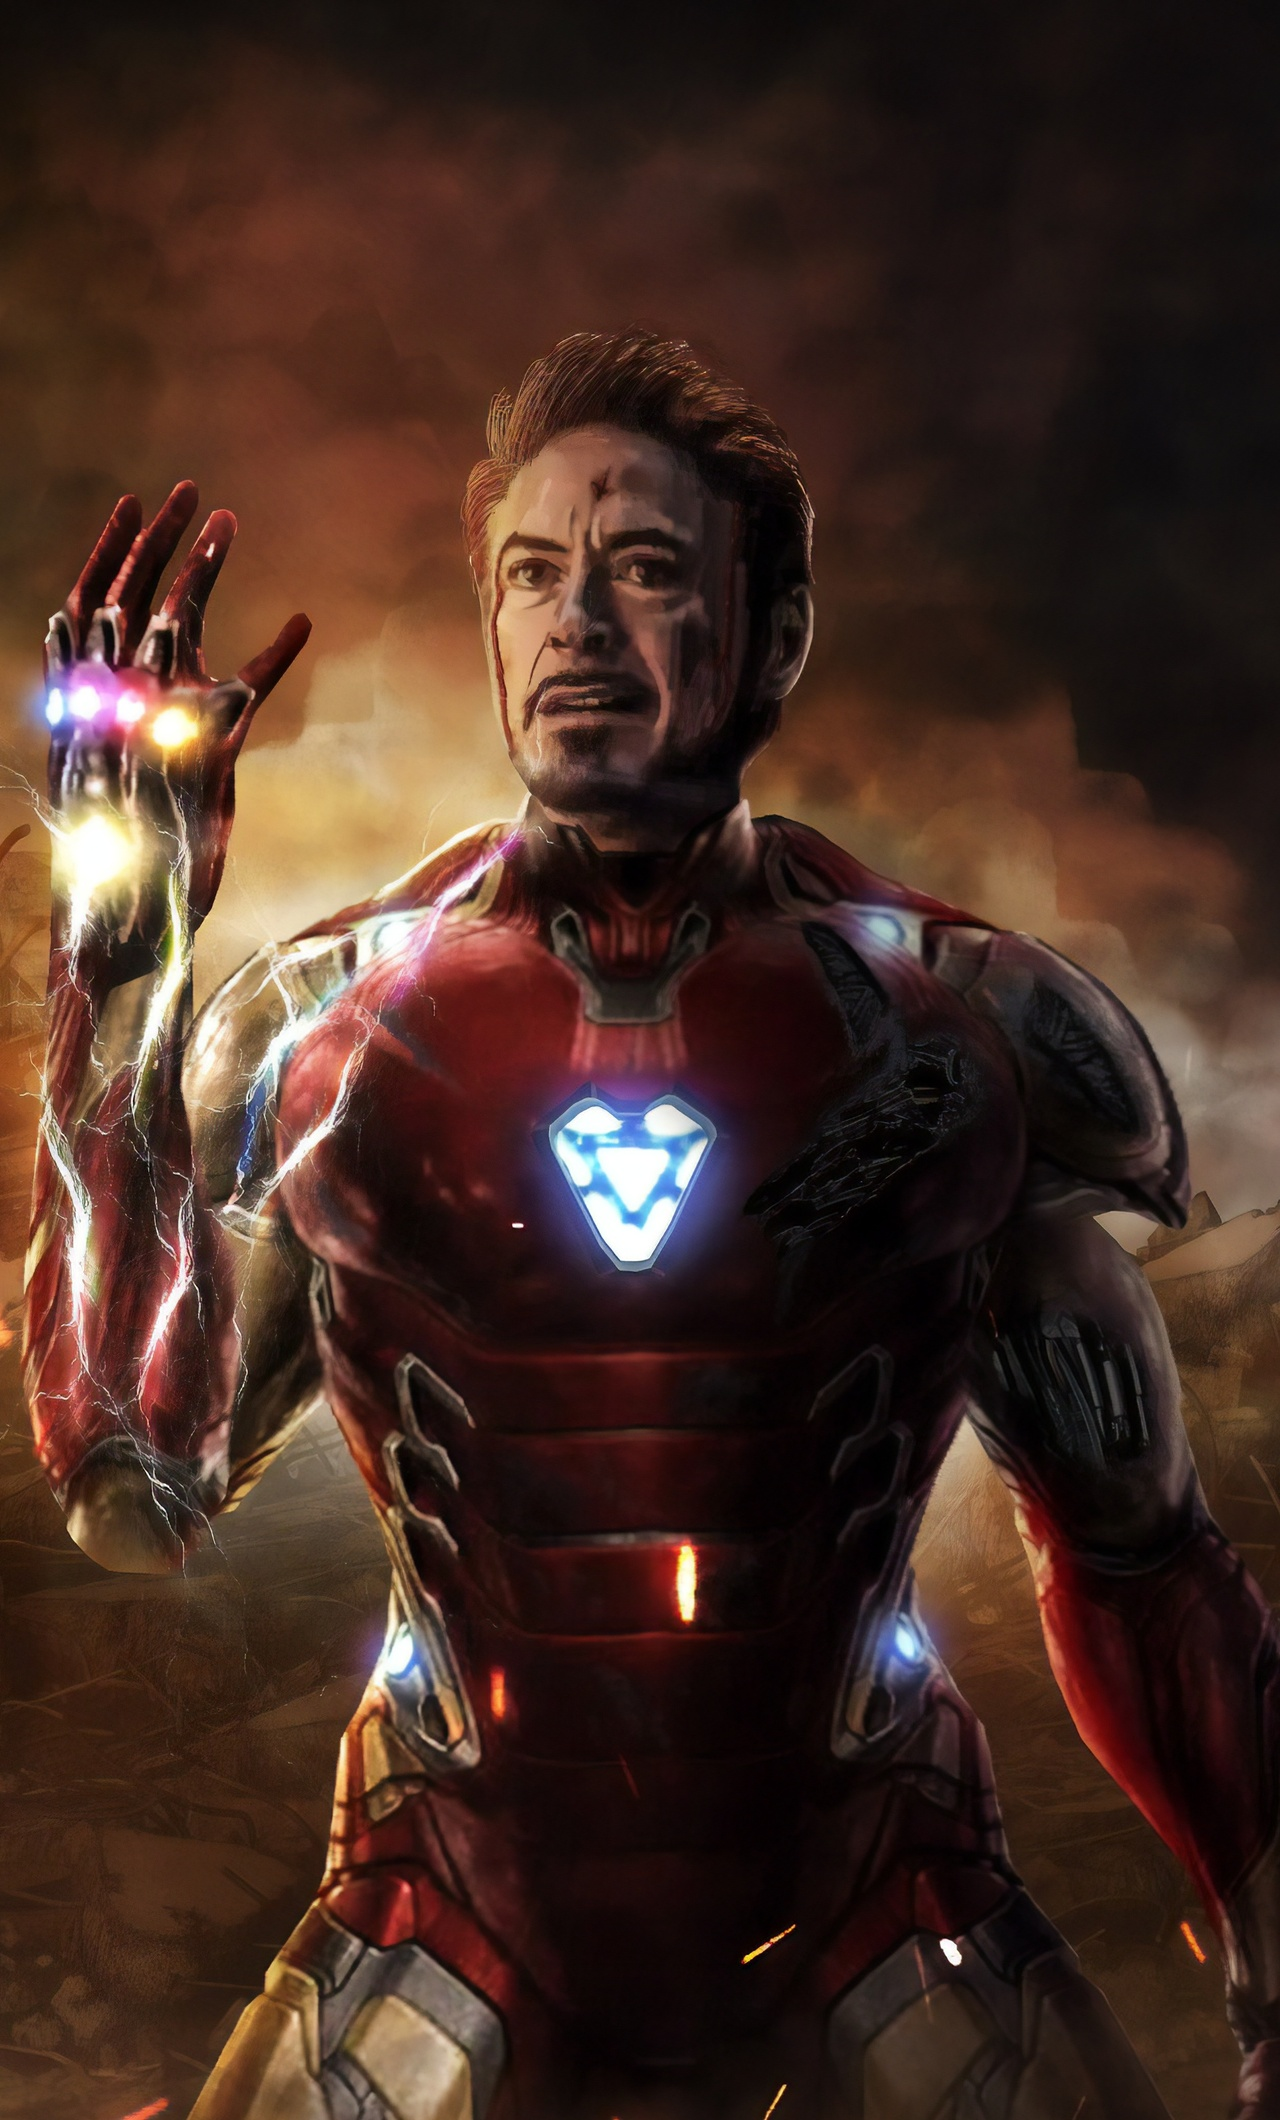 1280x2120 I Am Iron Man Avengers Endgame 5k Iphone 6 Hd 4k